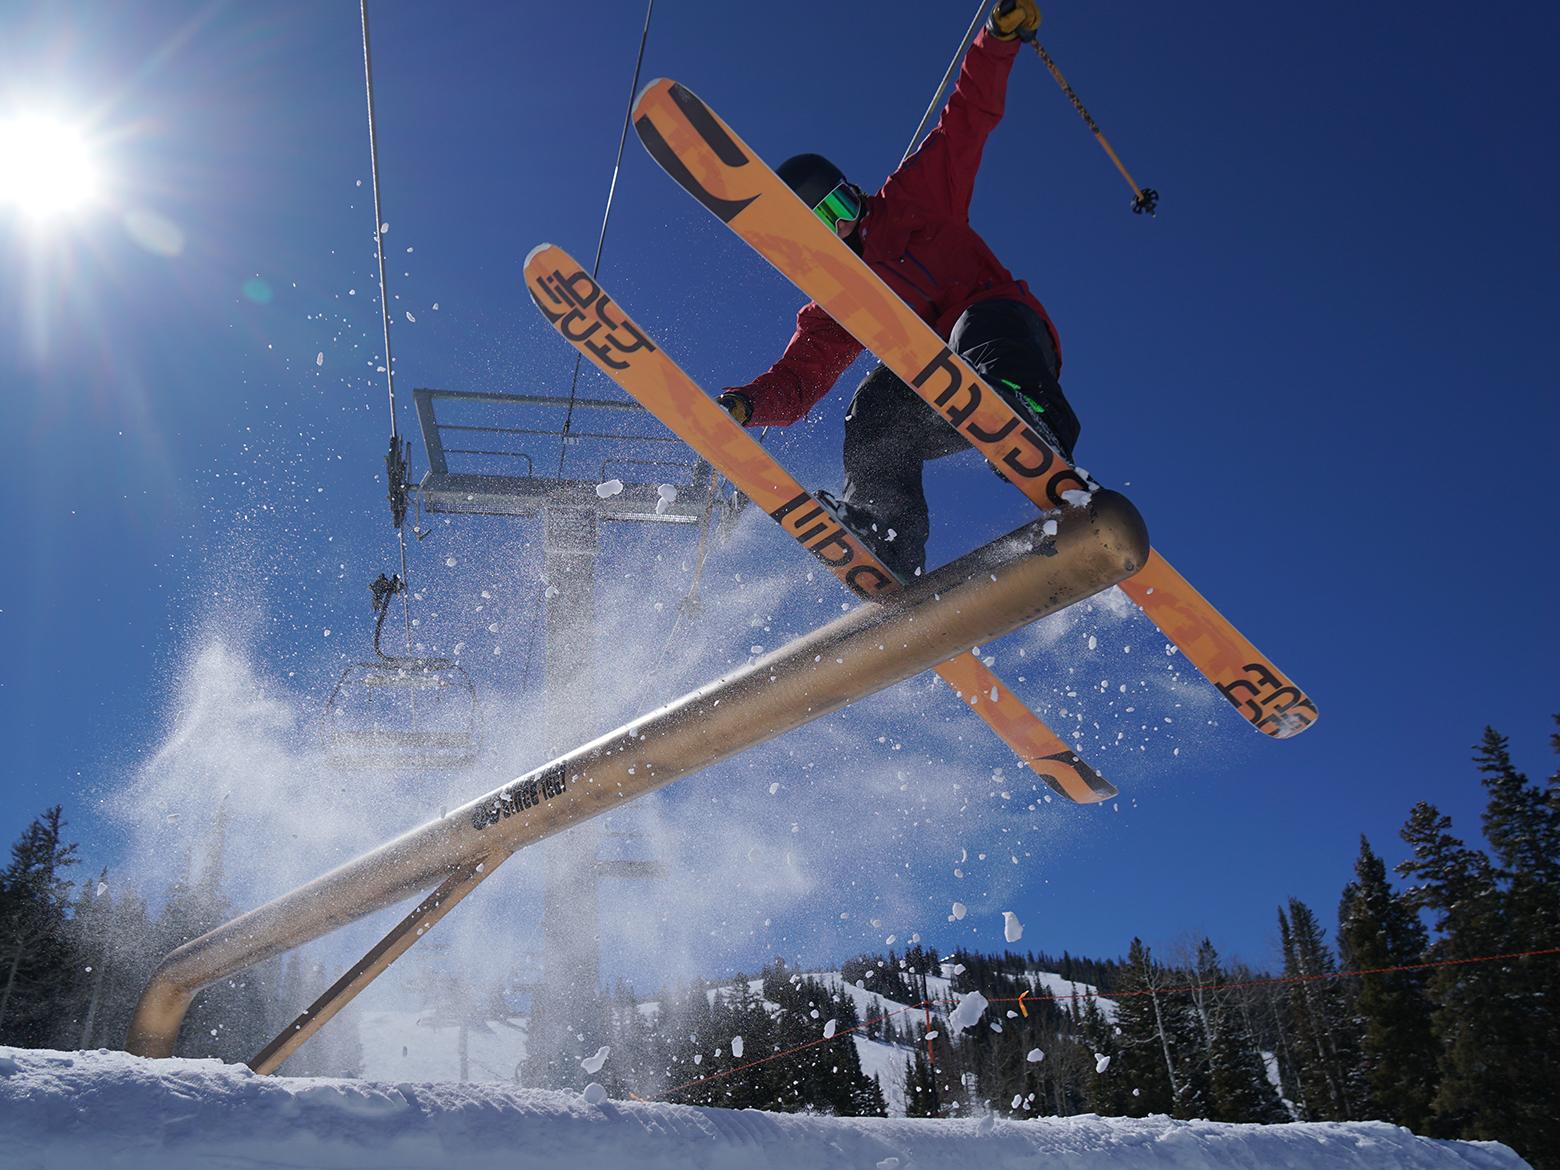 Liberty Skis Helix 84 All-Mountain, All-Terrain, Park, Junior, Kids, and Teen Ski